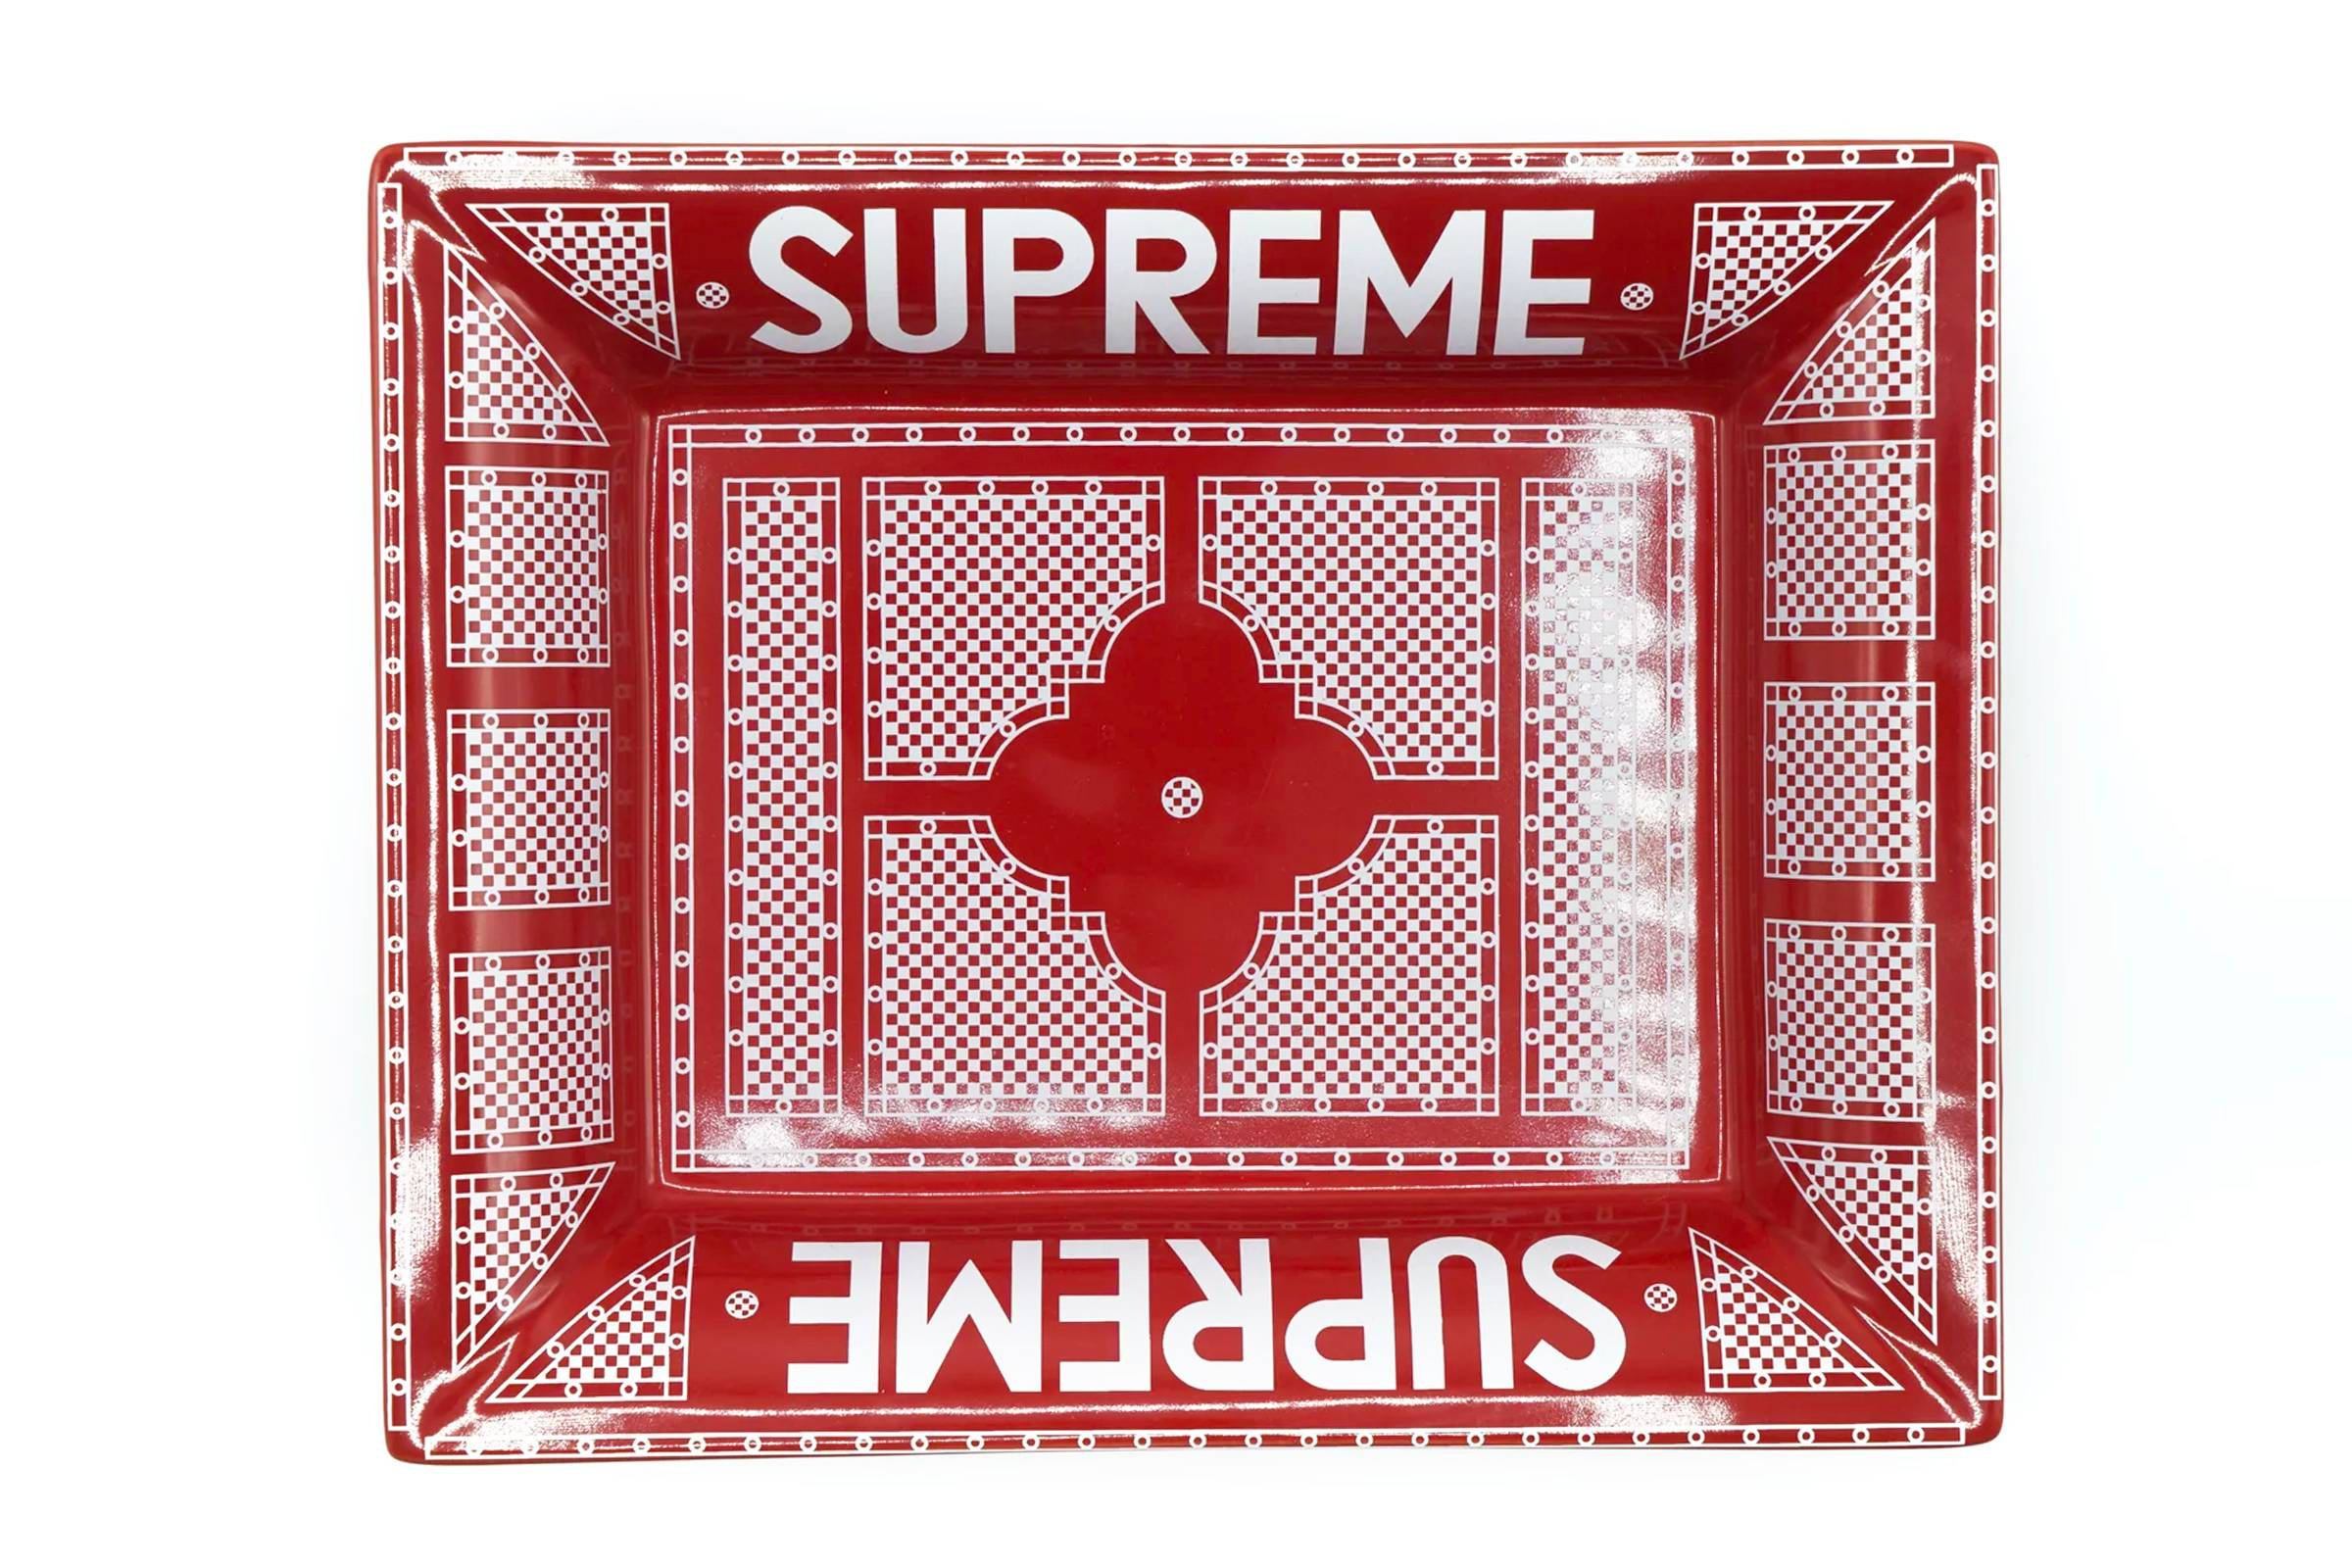 Supreme Hermès-Inspired Ashtray (Spring/Summer 2012)